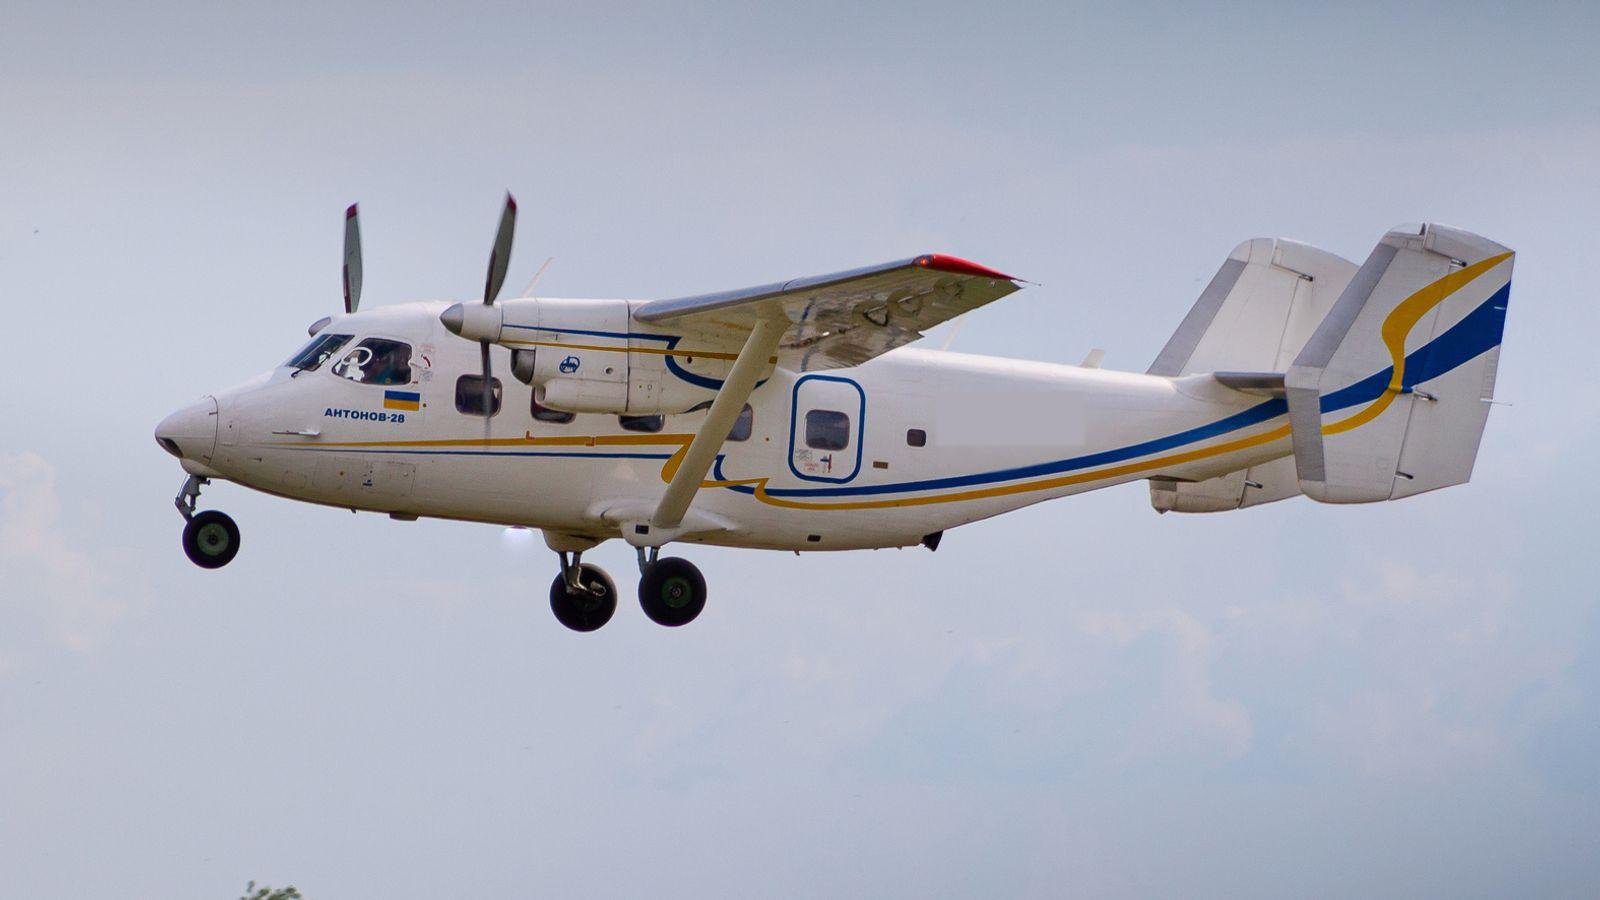 Russian passenger plane has gone missing in Siberia